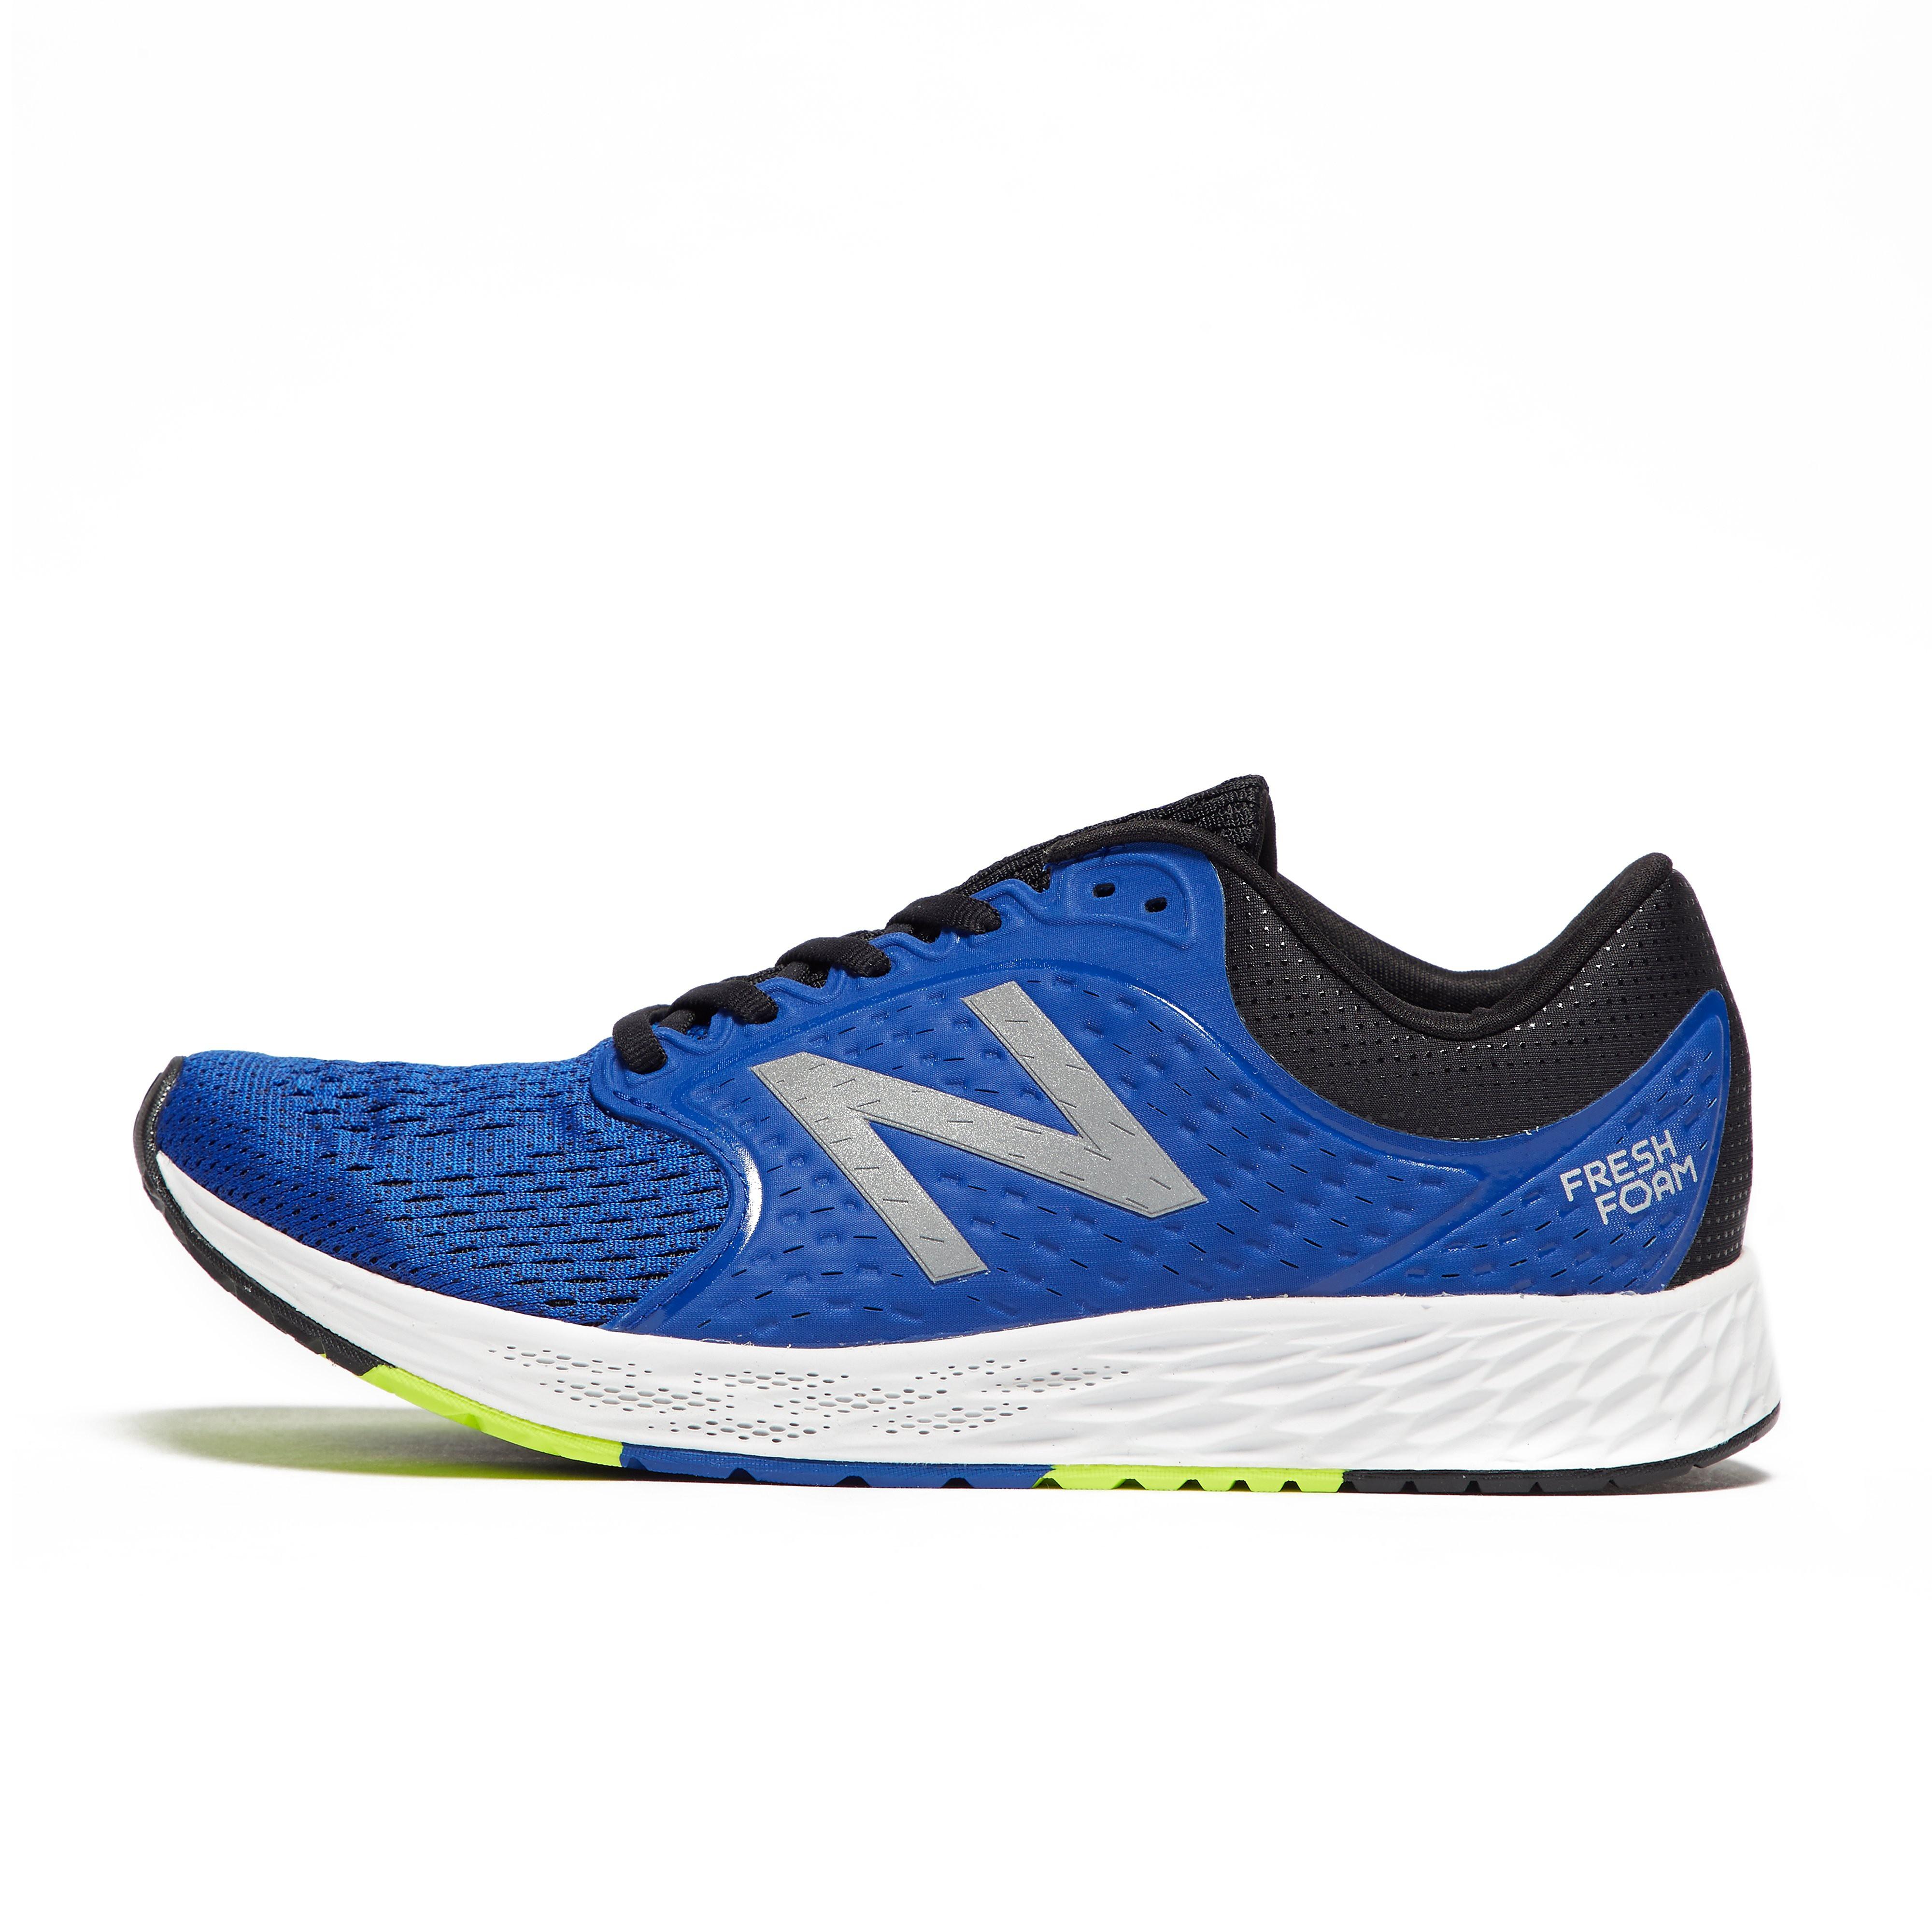 Mens Blue New Balance Fresh Foam Zante V4 Running Shoes